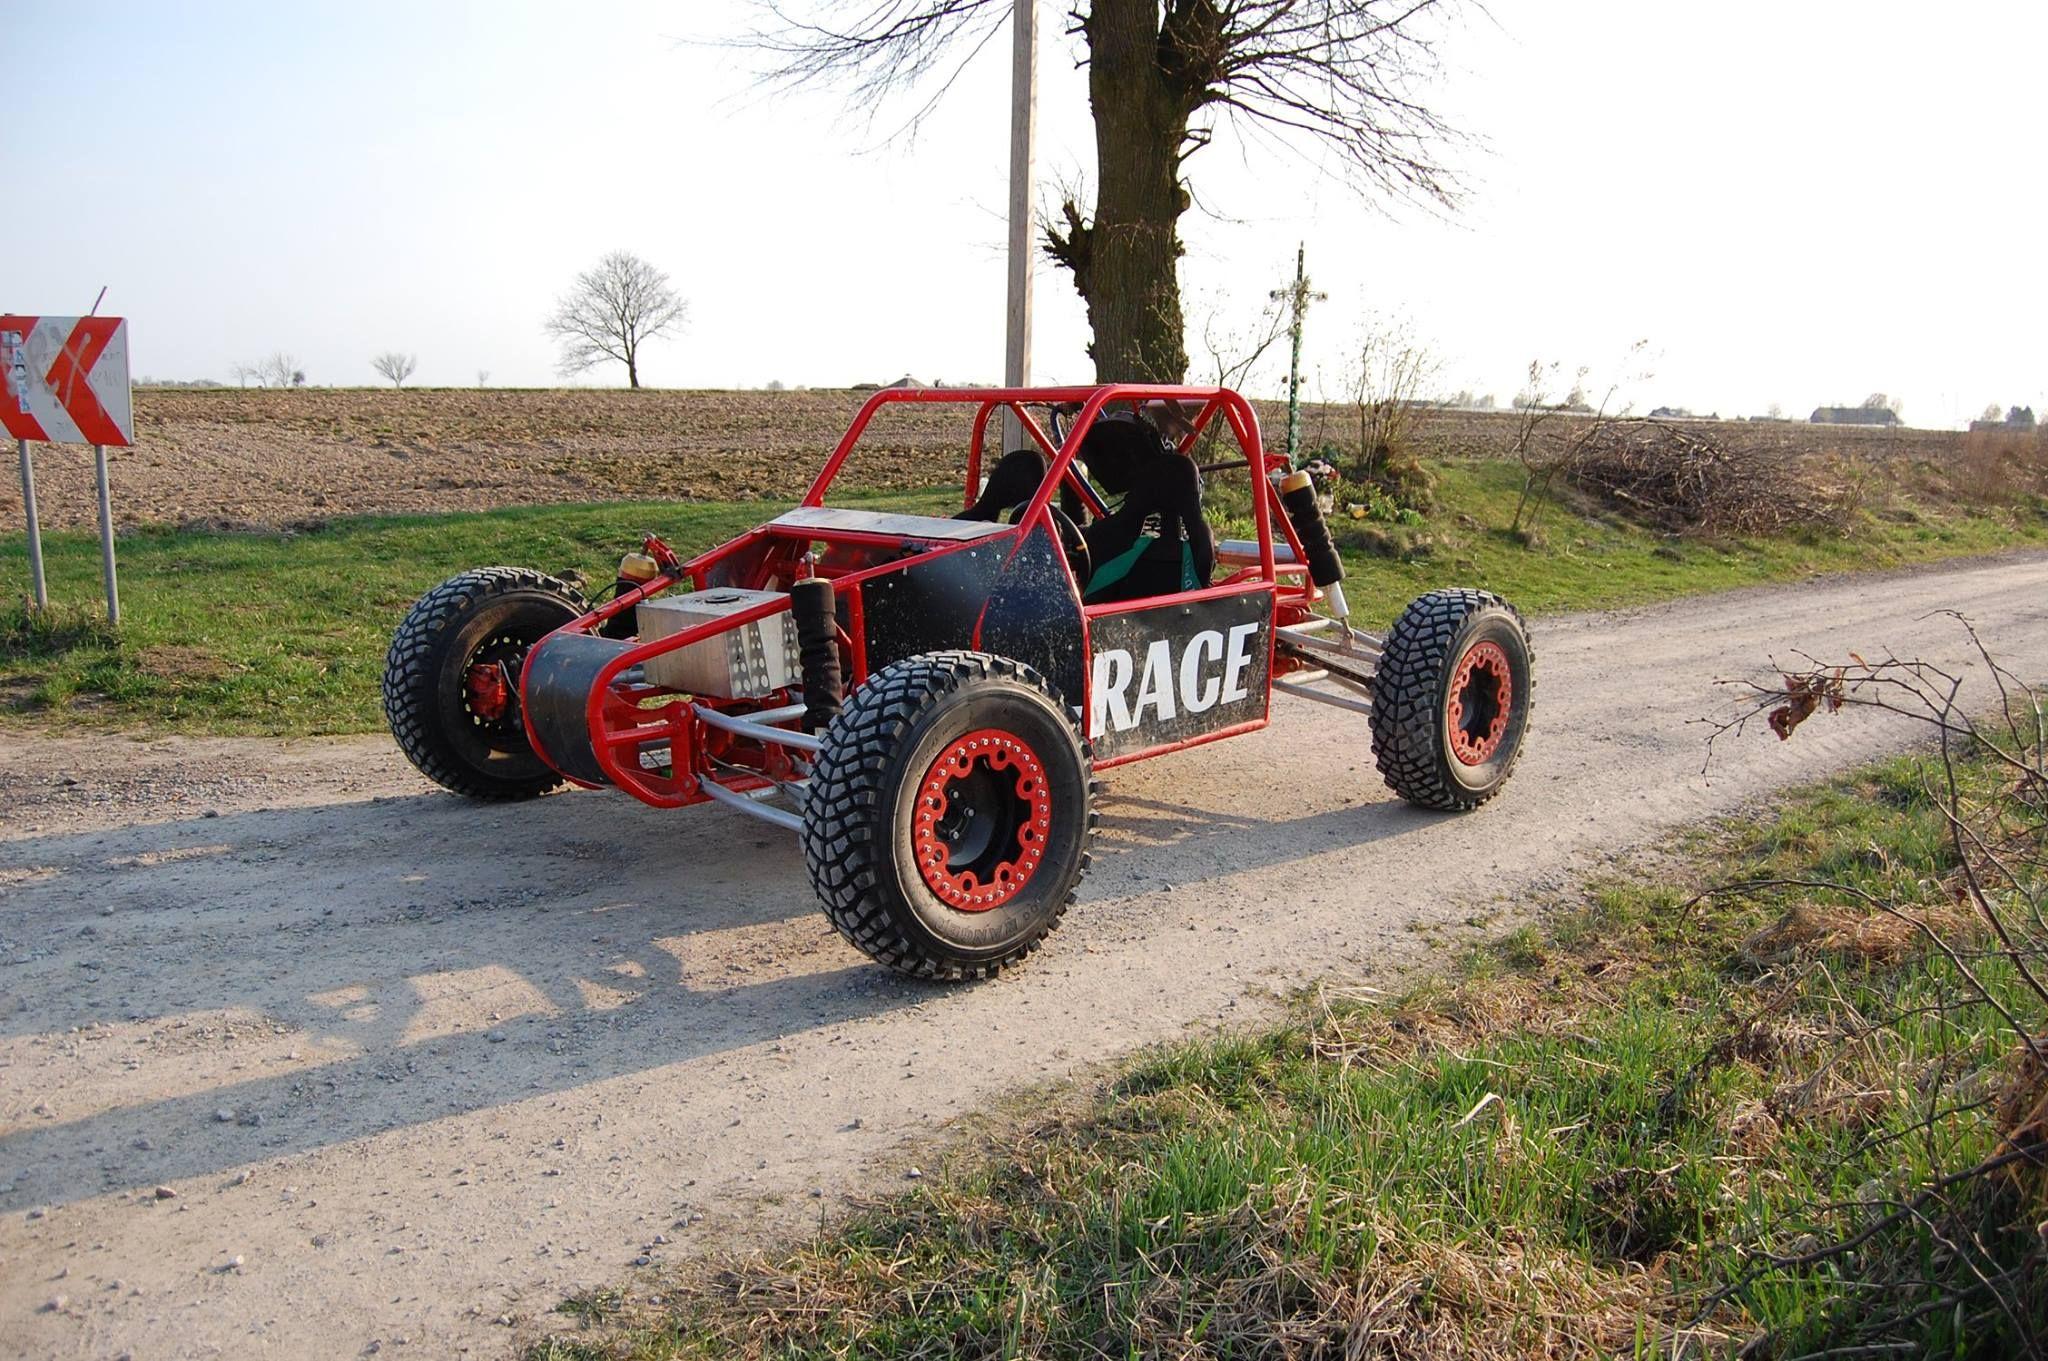 Buggy Kd Race Gsxr 1100 Fia Drift Utv Pedal Box 7209454863 Oficjalne Archiwum Allegro Gsxr 1100 Buggy Dune Buggy